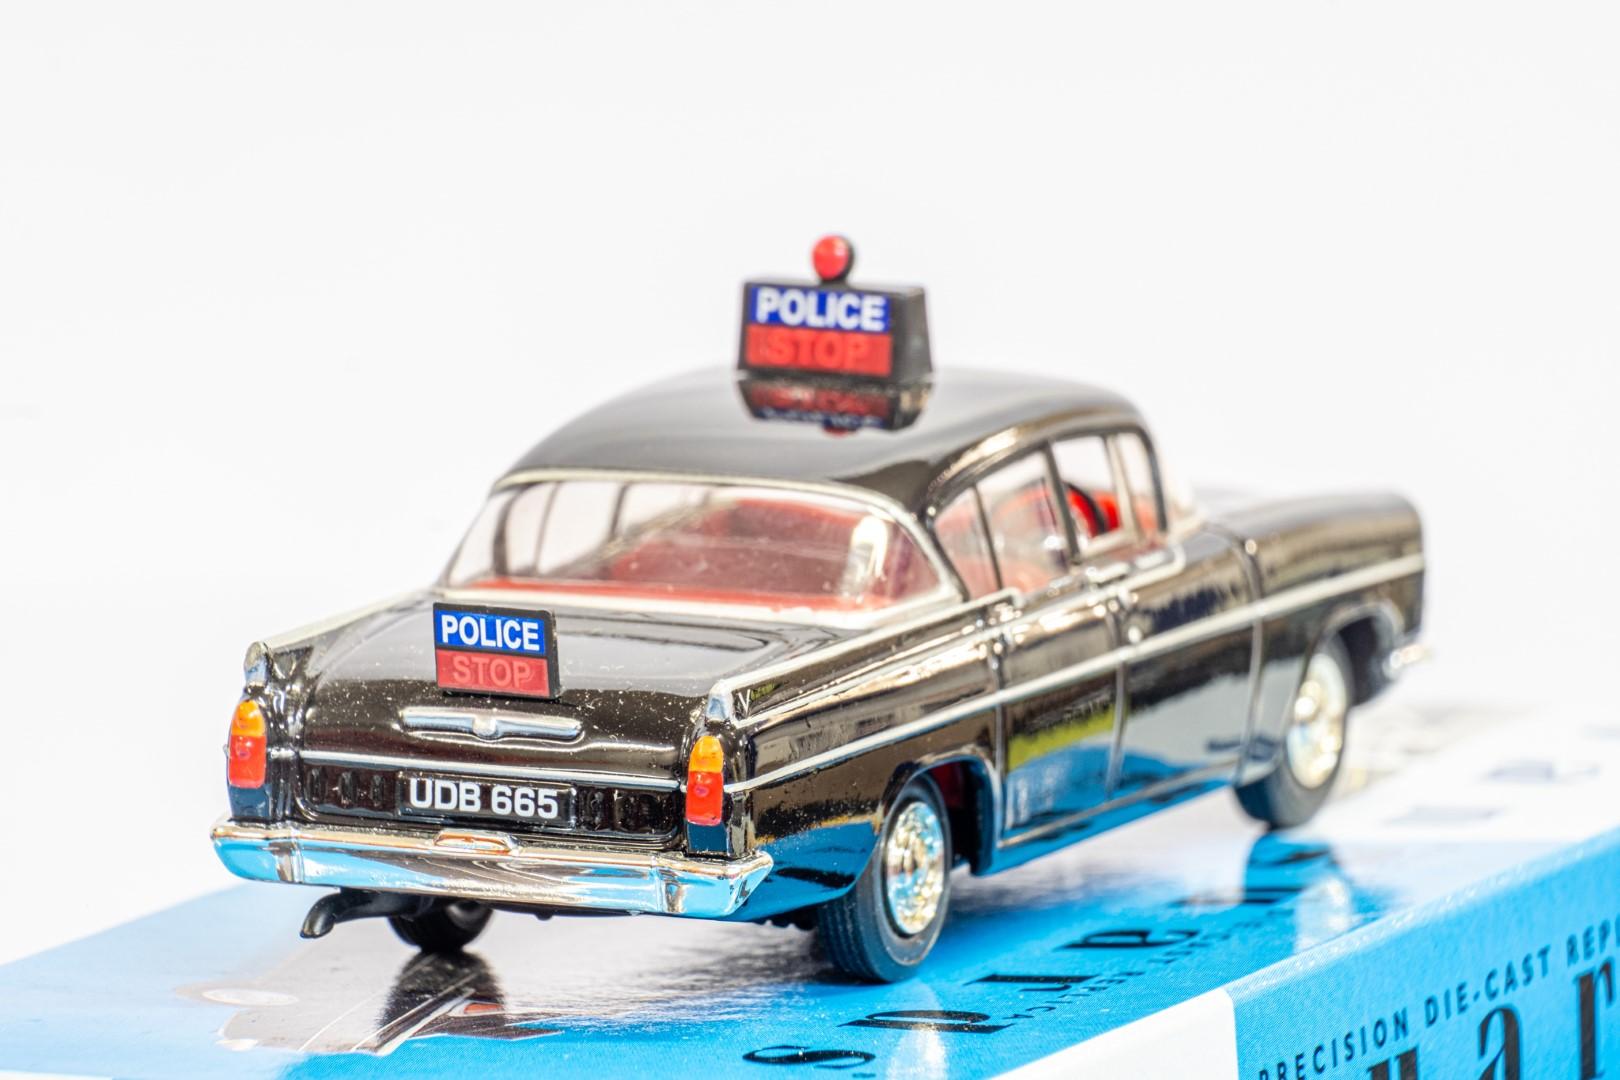 Vanguards Vauxhall Velox PA - Stockport Borough Police - Image 7 of 8